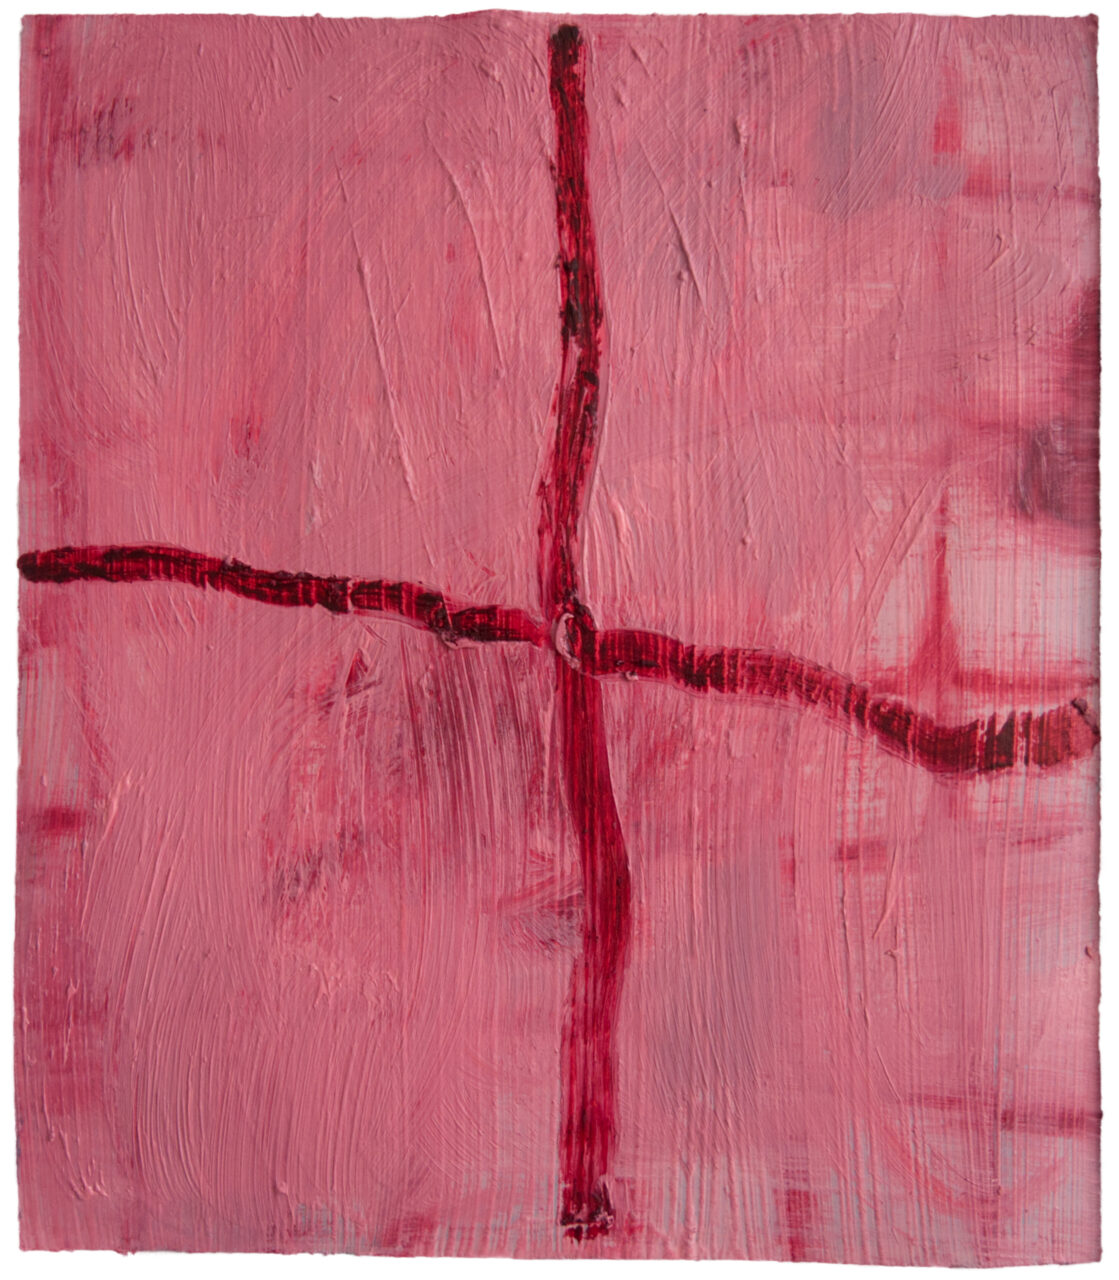 cochenille grid, 2021, oil on paper, 31,5 x 27 cm